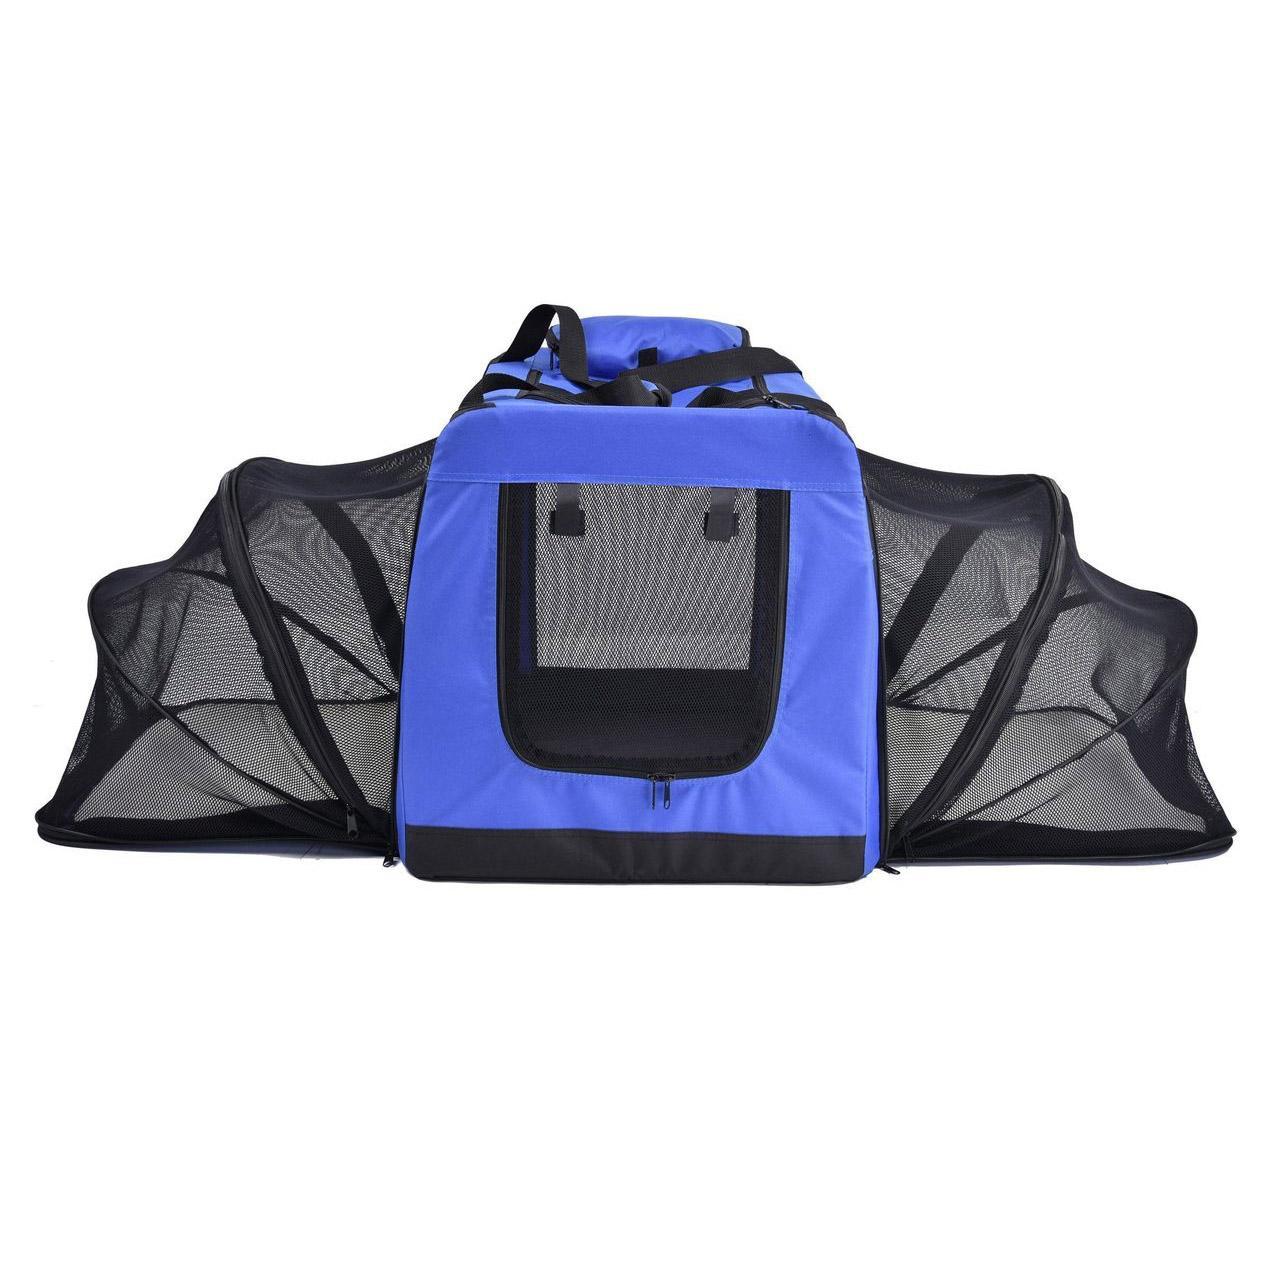 Pet Life Hounda Accordion Metal Frame Soft Folding Expandable Dog Crate - Blue